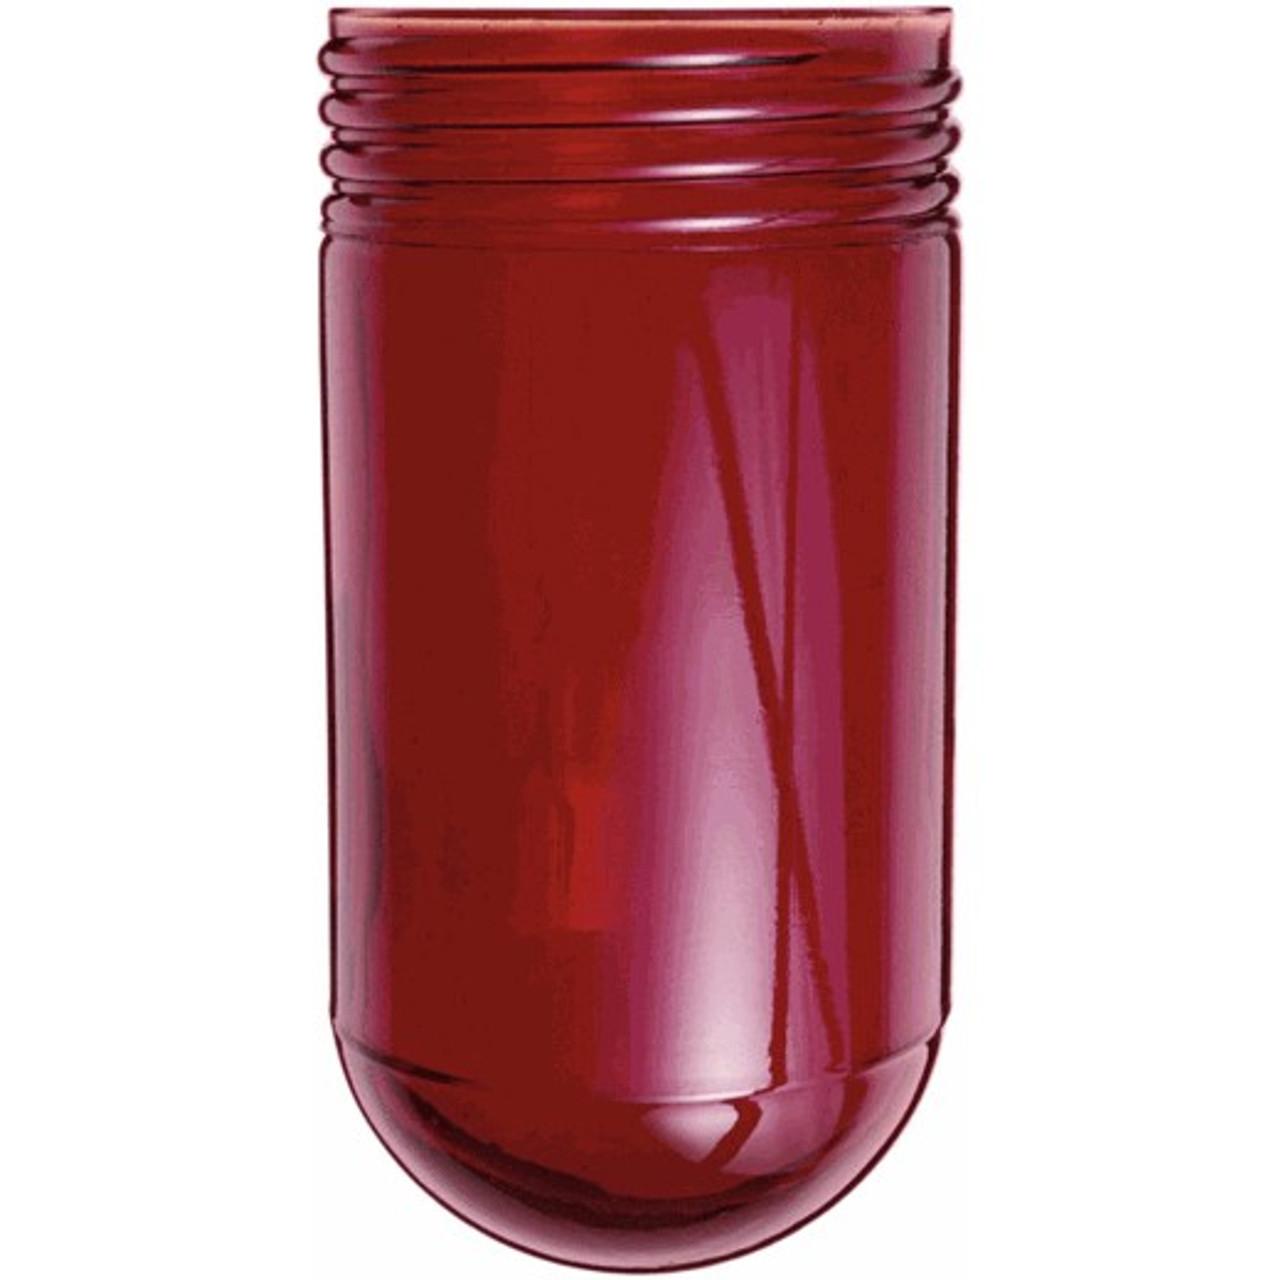 Red mason jar glass